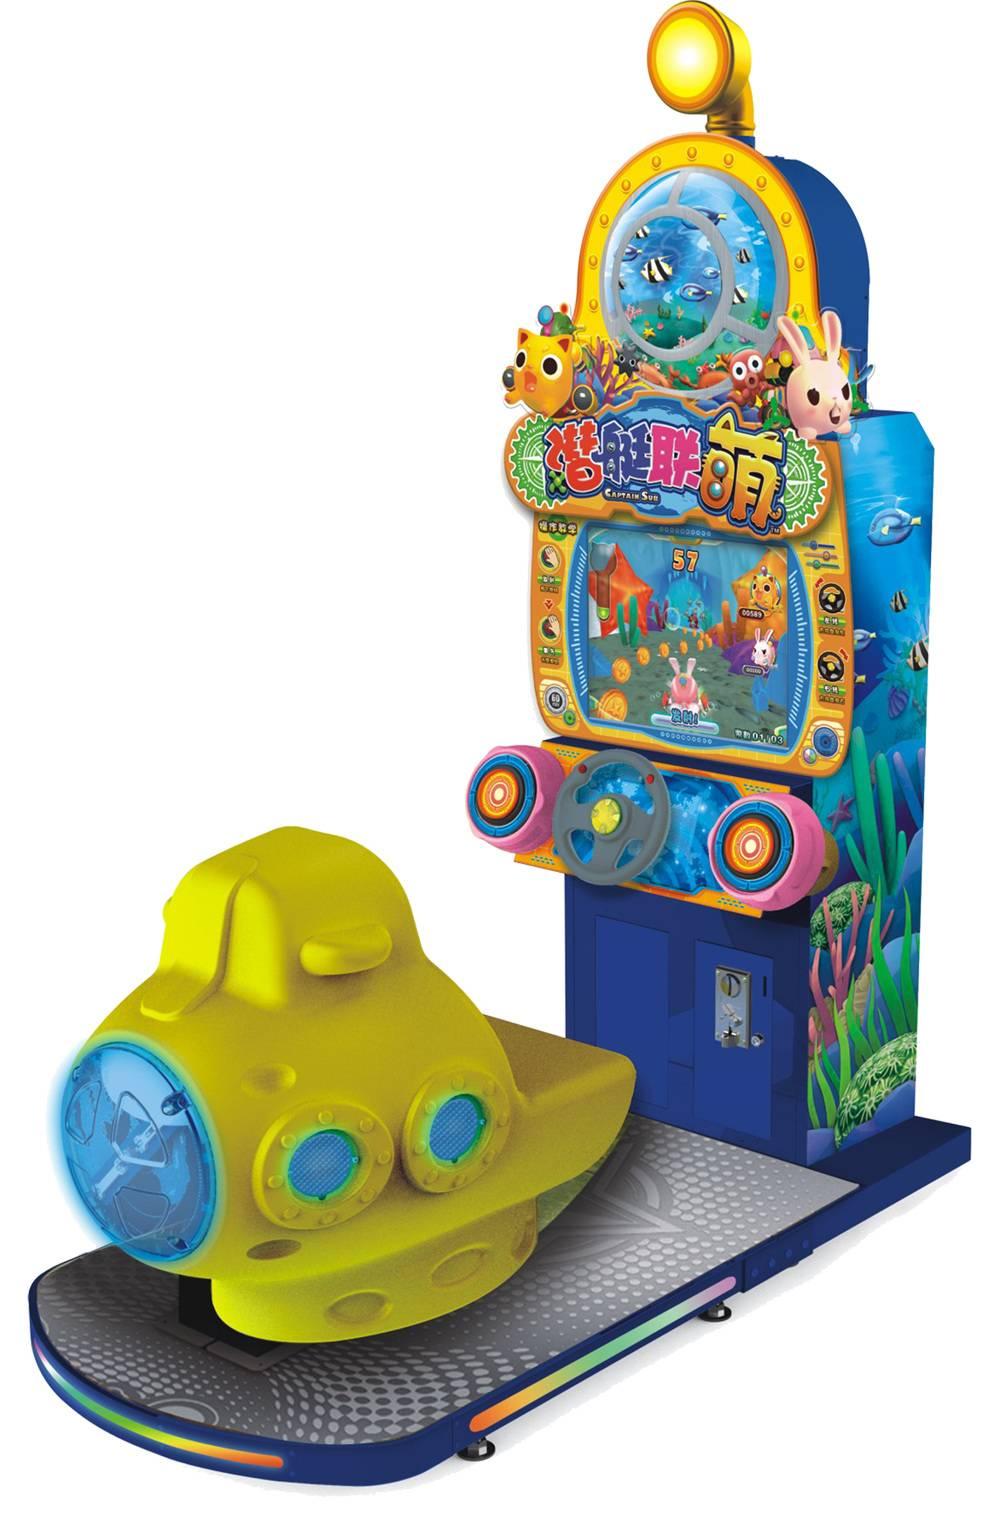 Captain Sub Virtual Kiddie Rides Game Machine